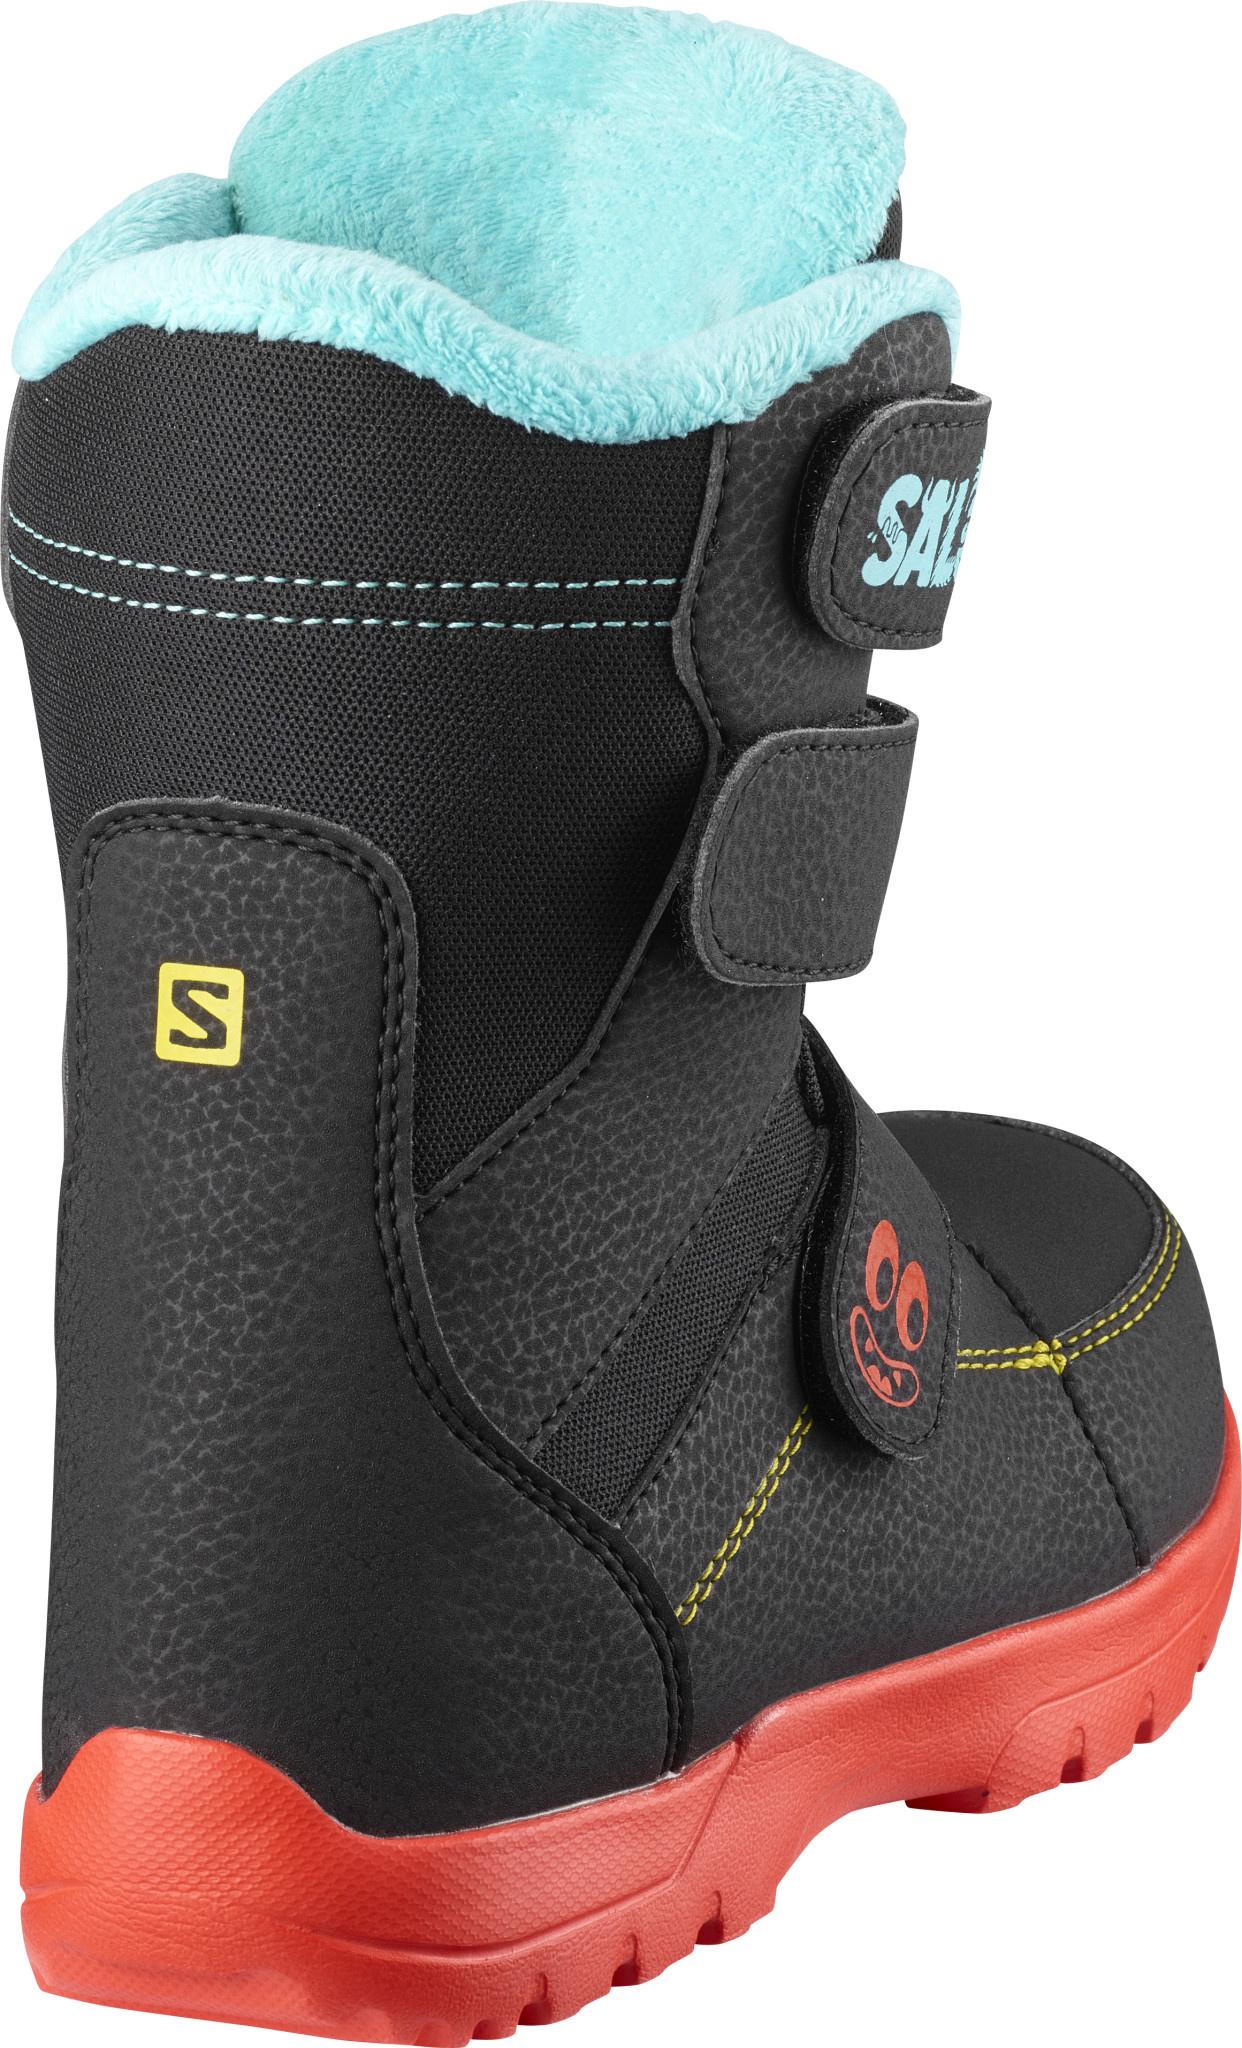 SALOMON Salomon Youth Whipstar Snowboard Boot (2021)